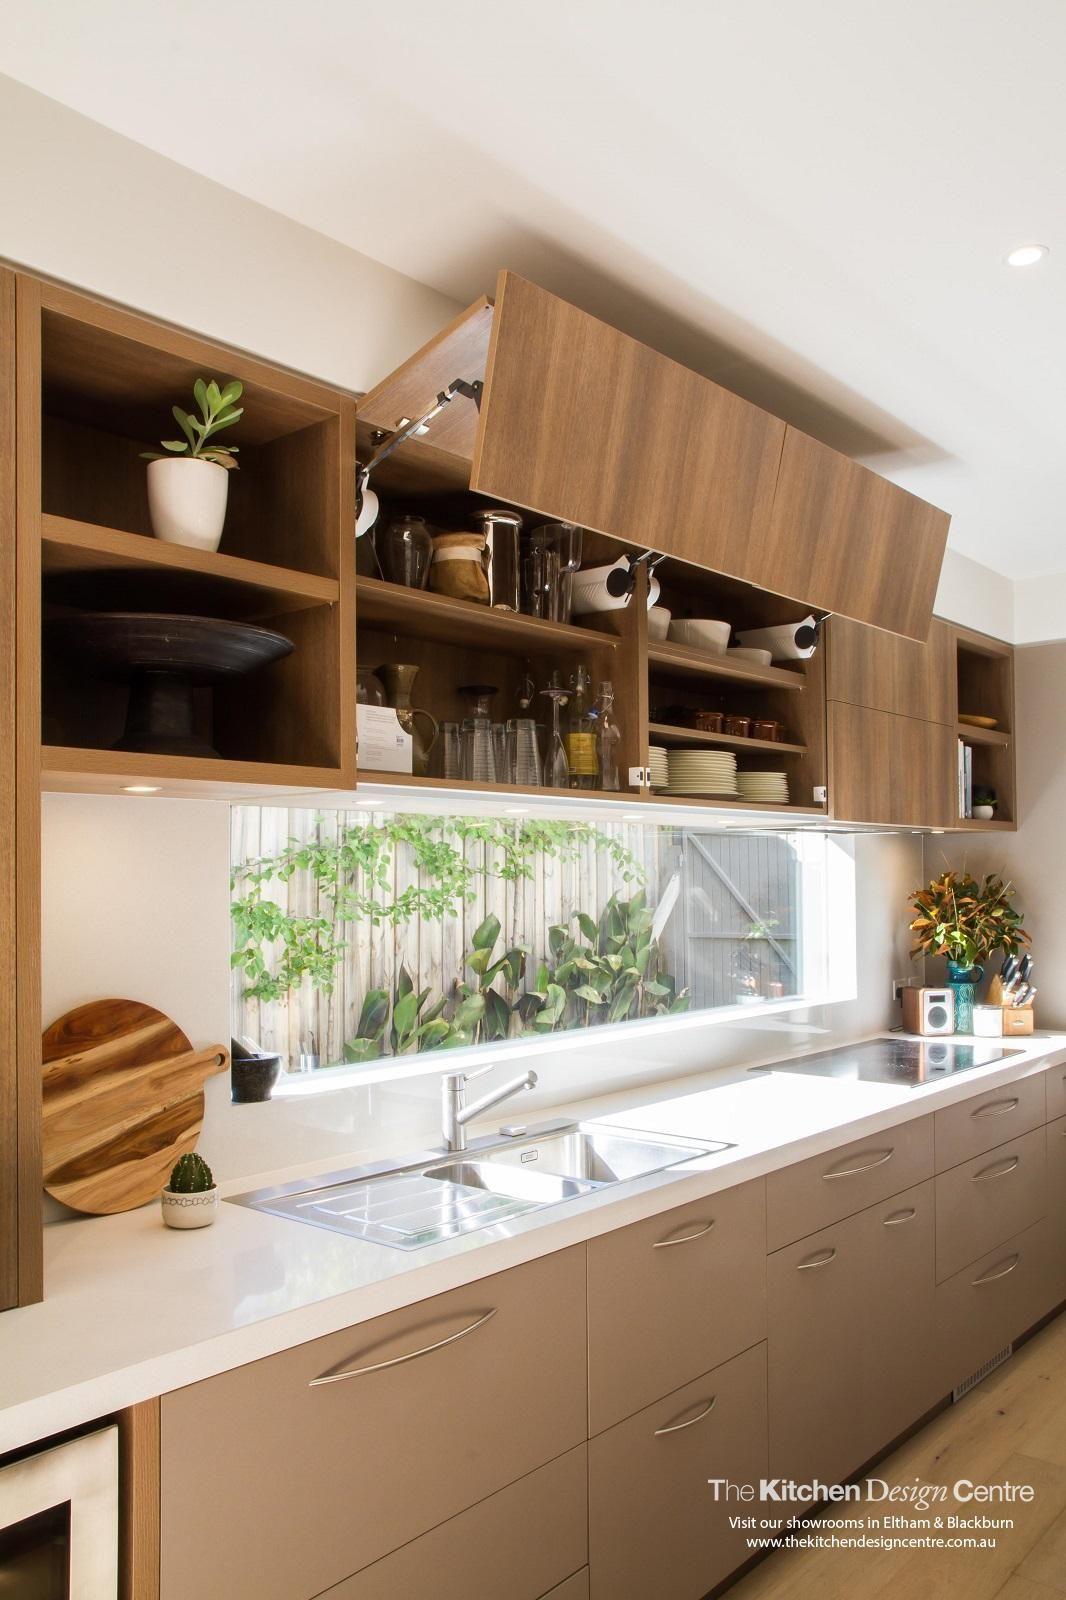 Super cool kitchen design ideas in polytec Sepia Oak Ravine. http ...